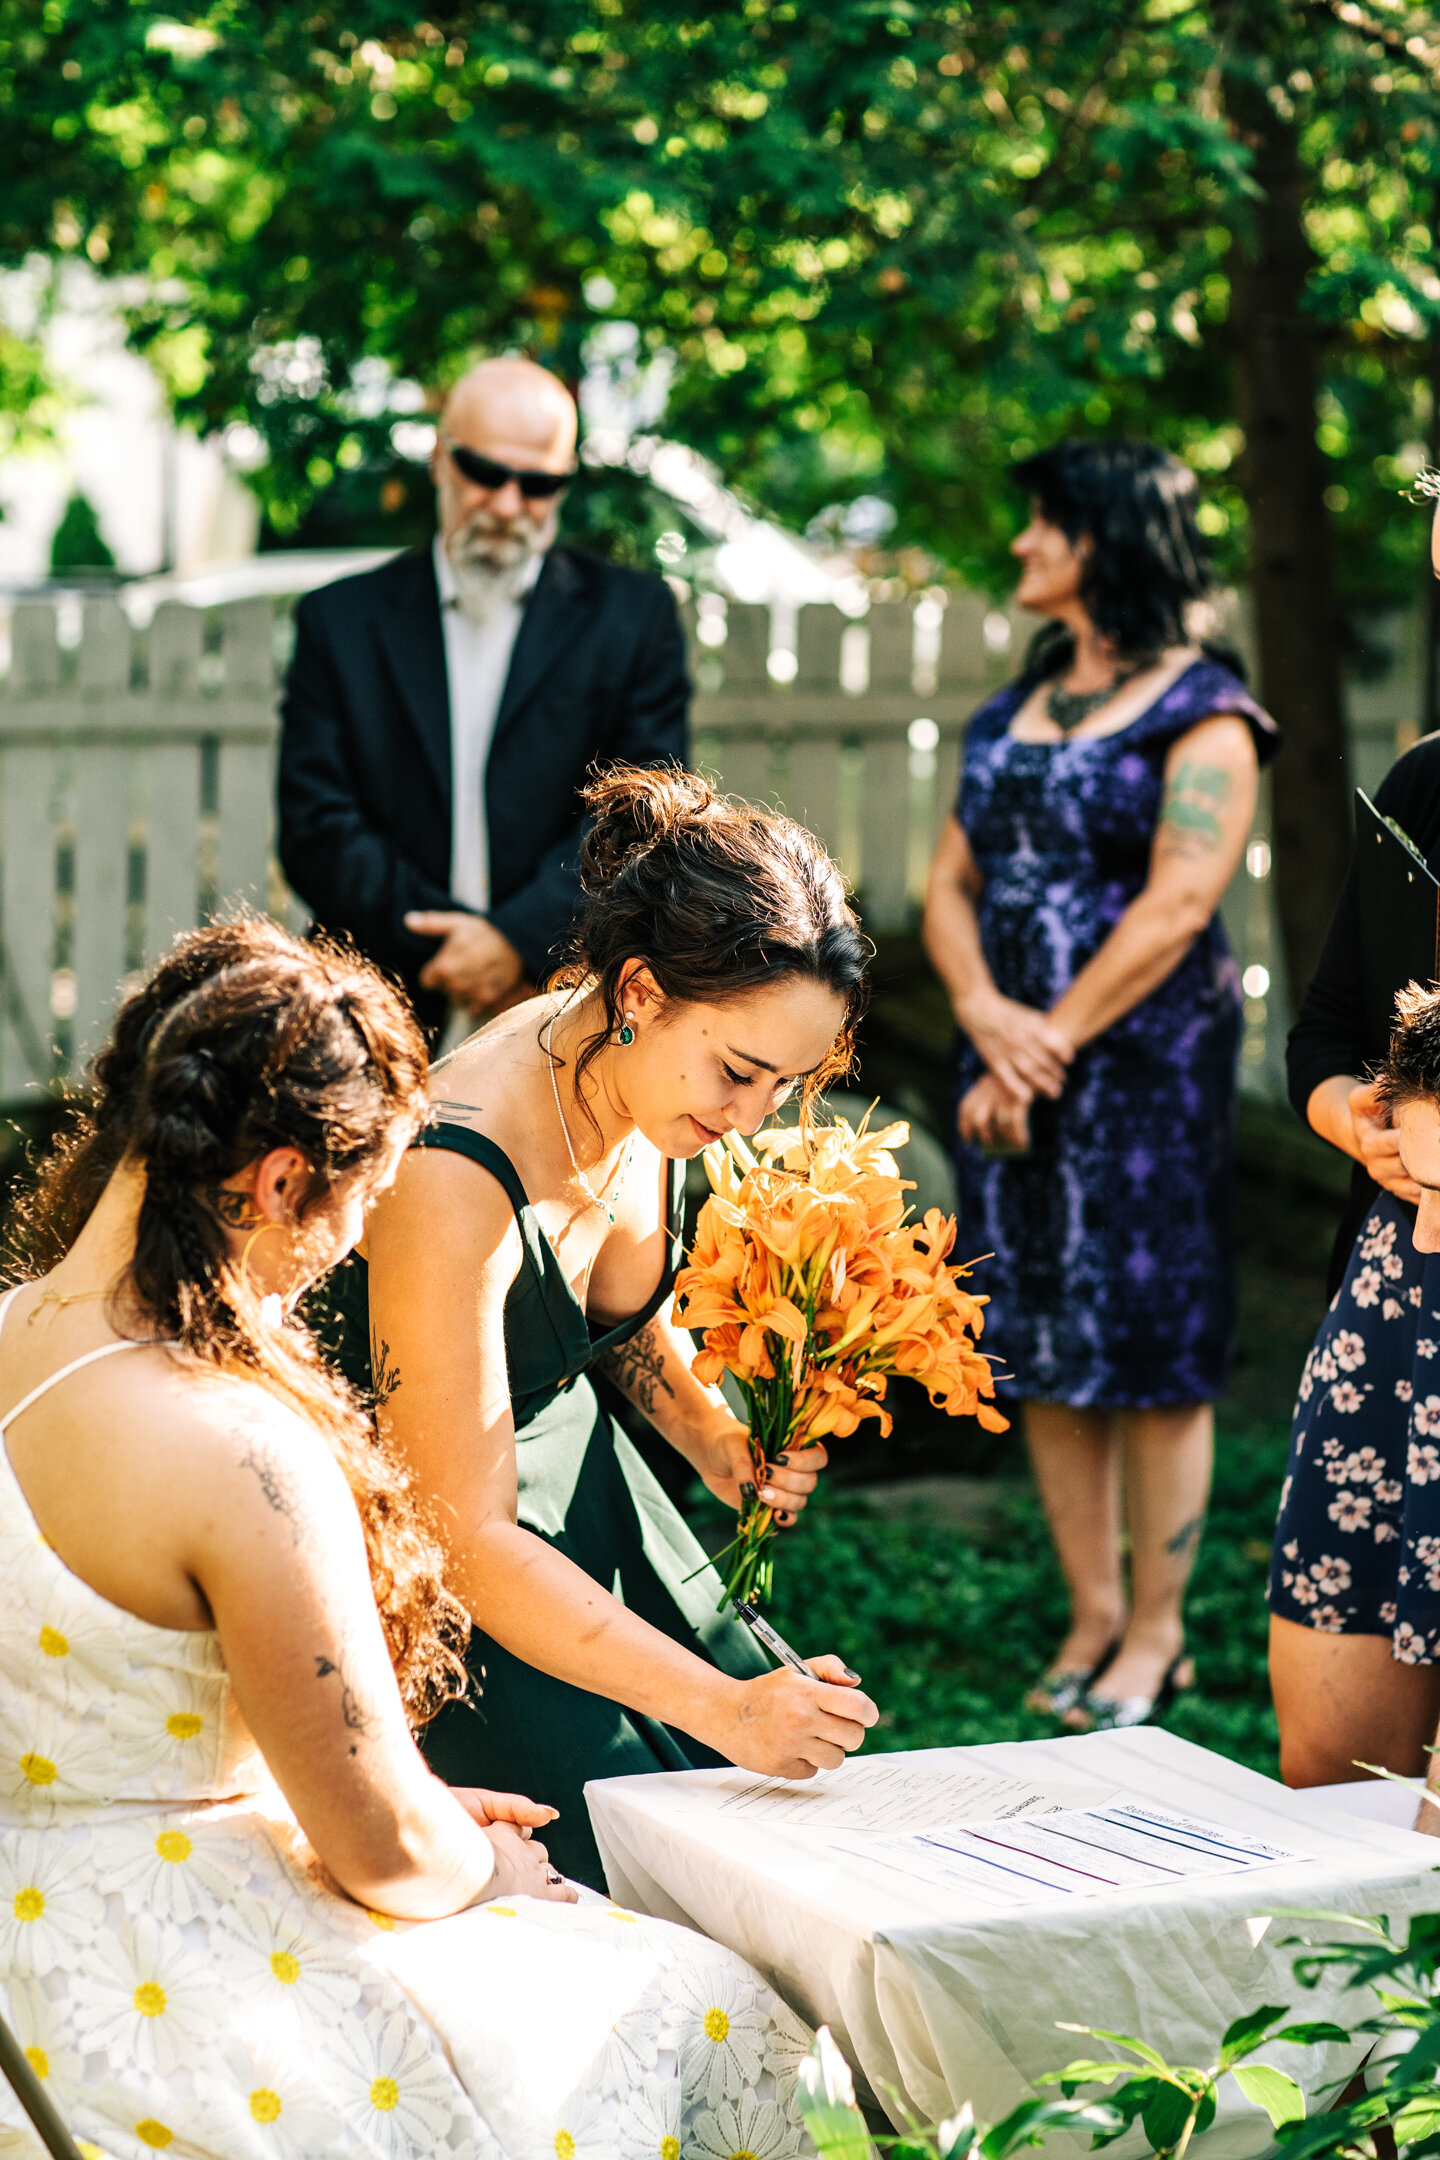 Jake-Amber-Wedding-07226.jpg